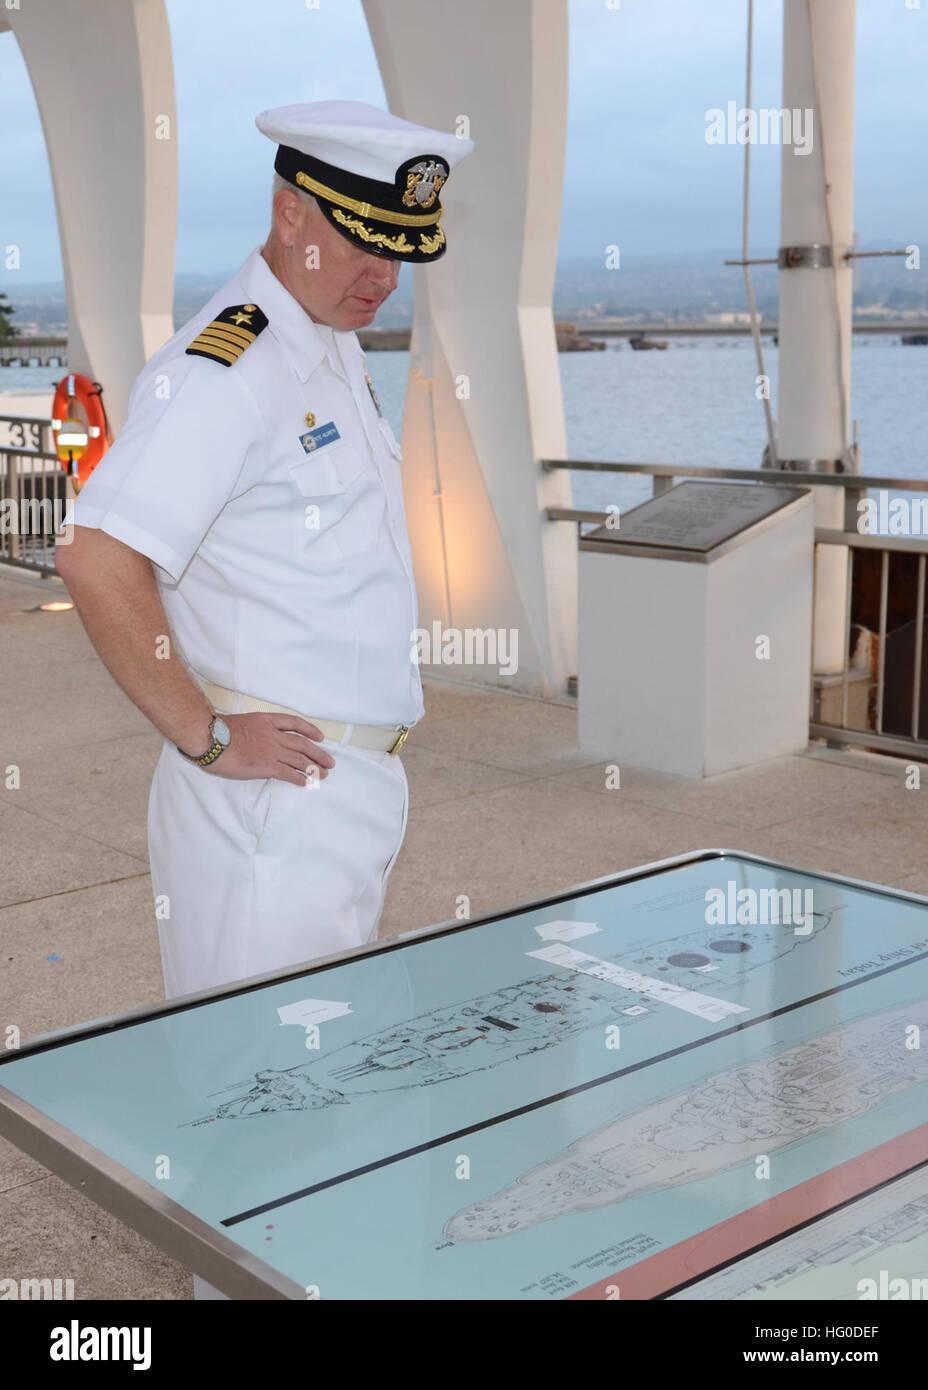 120126-N-CO162-006 PEARL HARBOR (Jan. 27, 2012) Capt. Pete Hildreth, commanding officer of the submarine tender - Stock Image